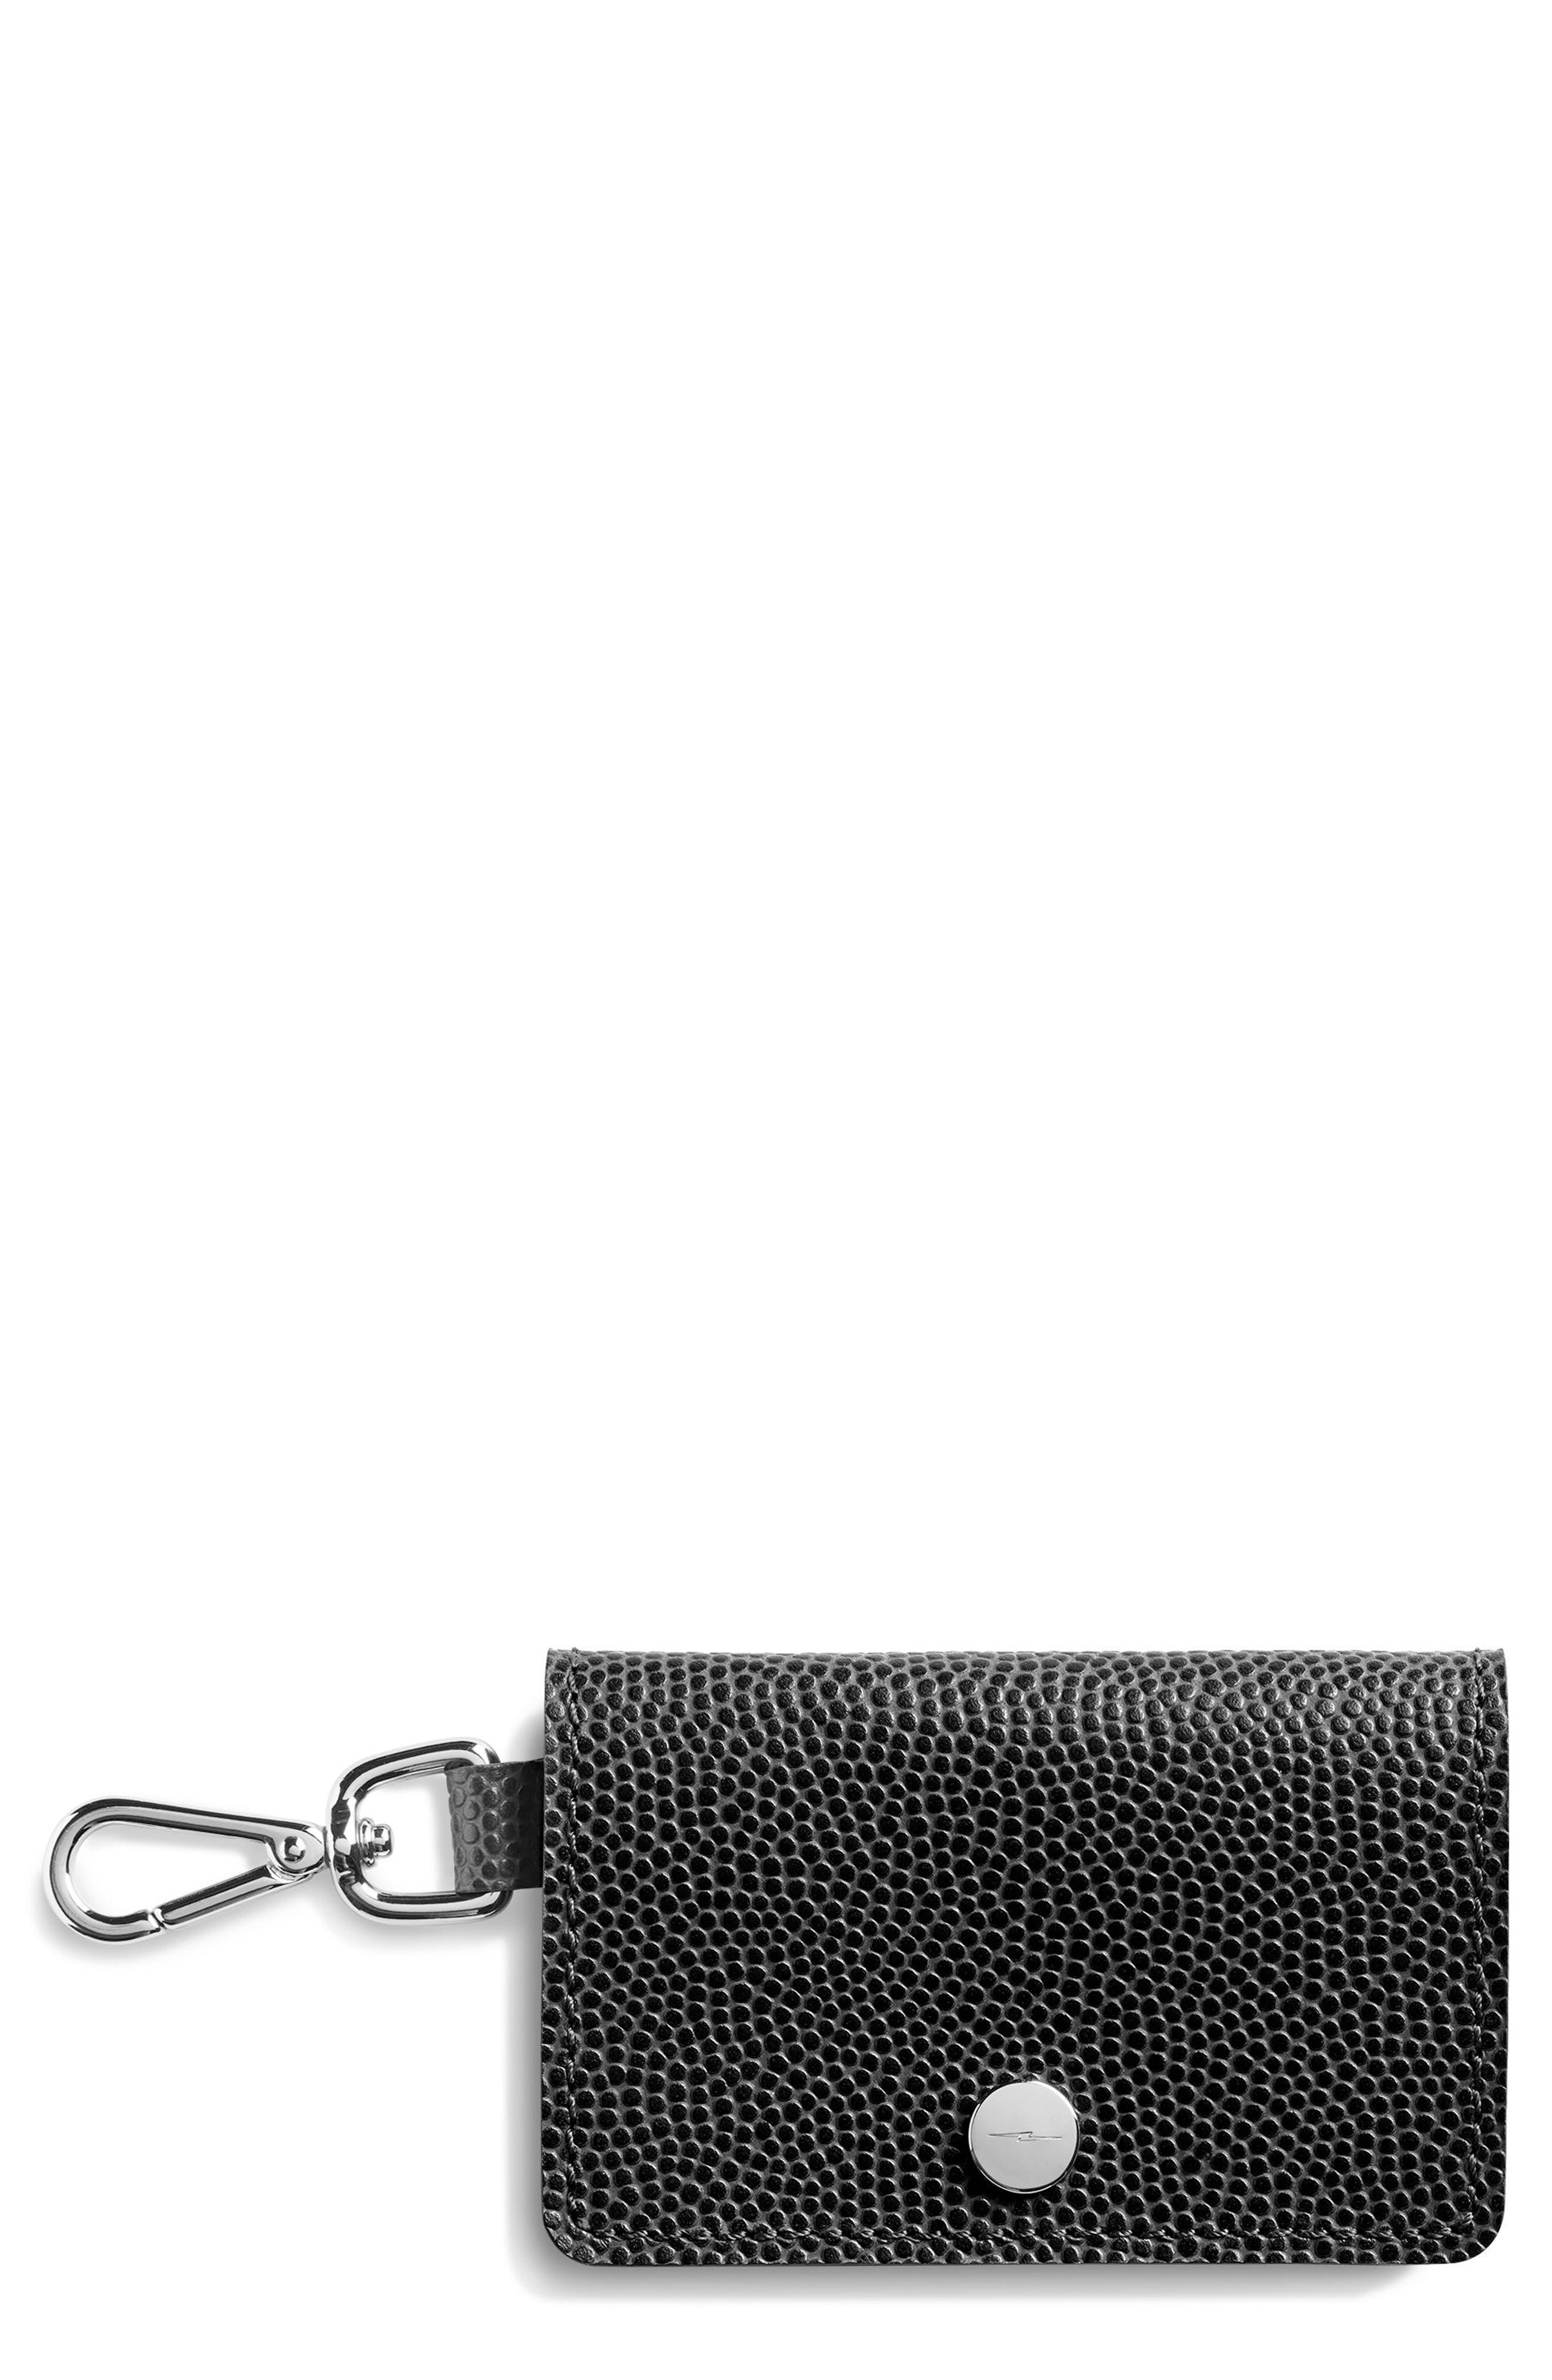 Latigo Leather Card Case,                             Main thumbnail 1, color,                             Black